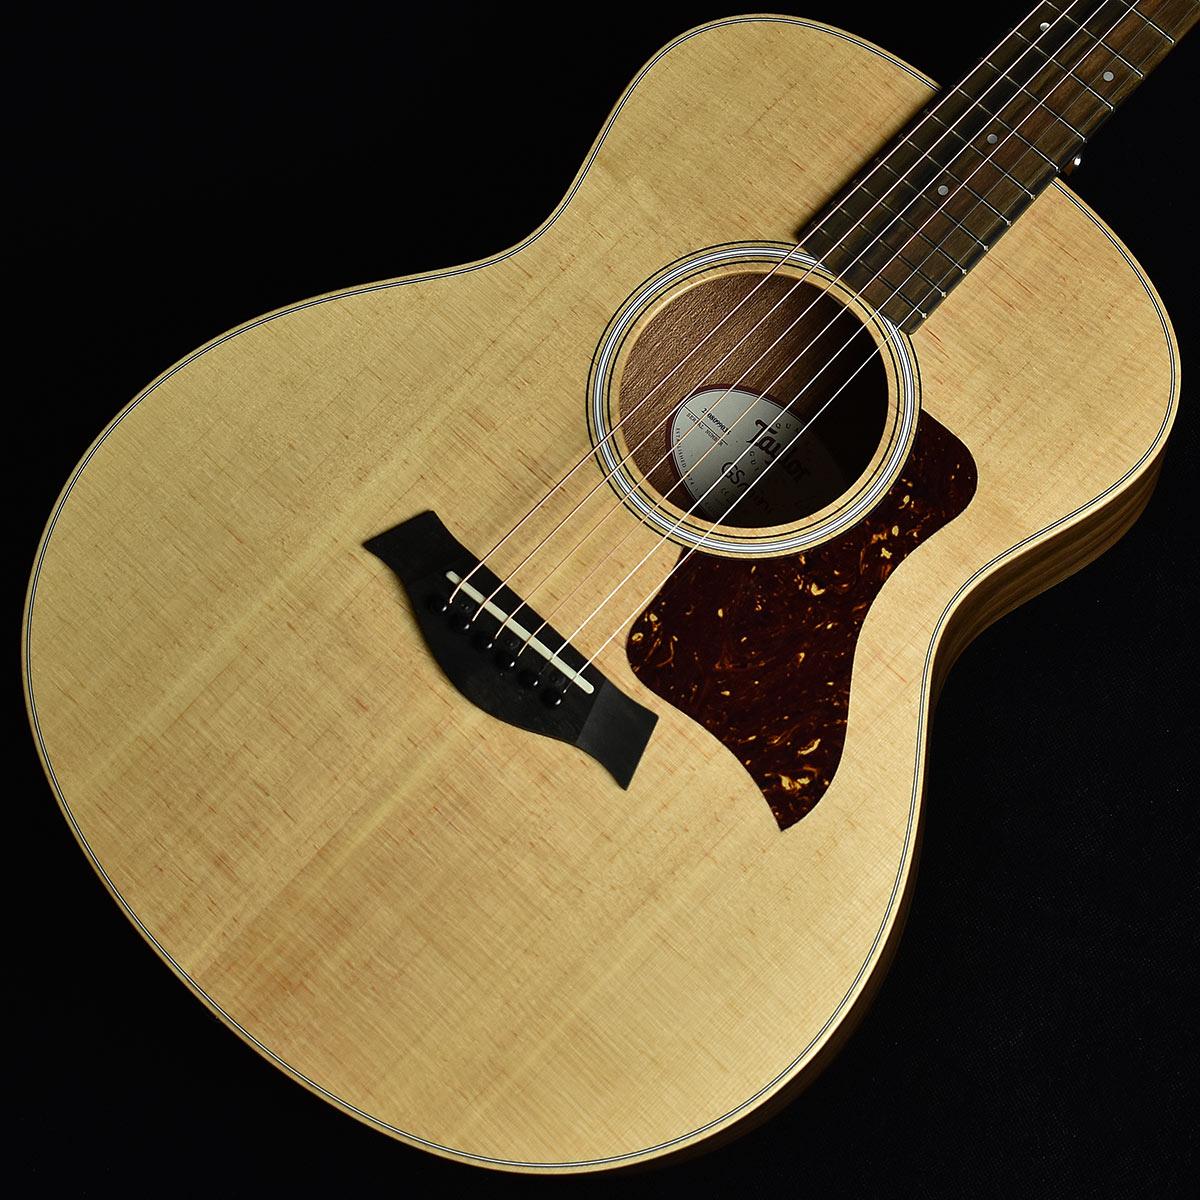 Taylor GS Mini-e Walnut S/N:2108099035 【生産完了モデル】【エレアコ】ミニアコースティックギター 【テイラー】【未展示品】